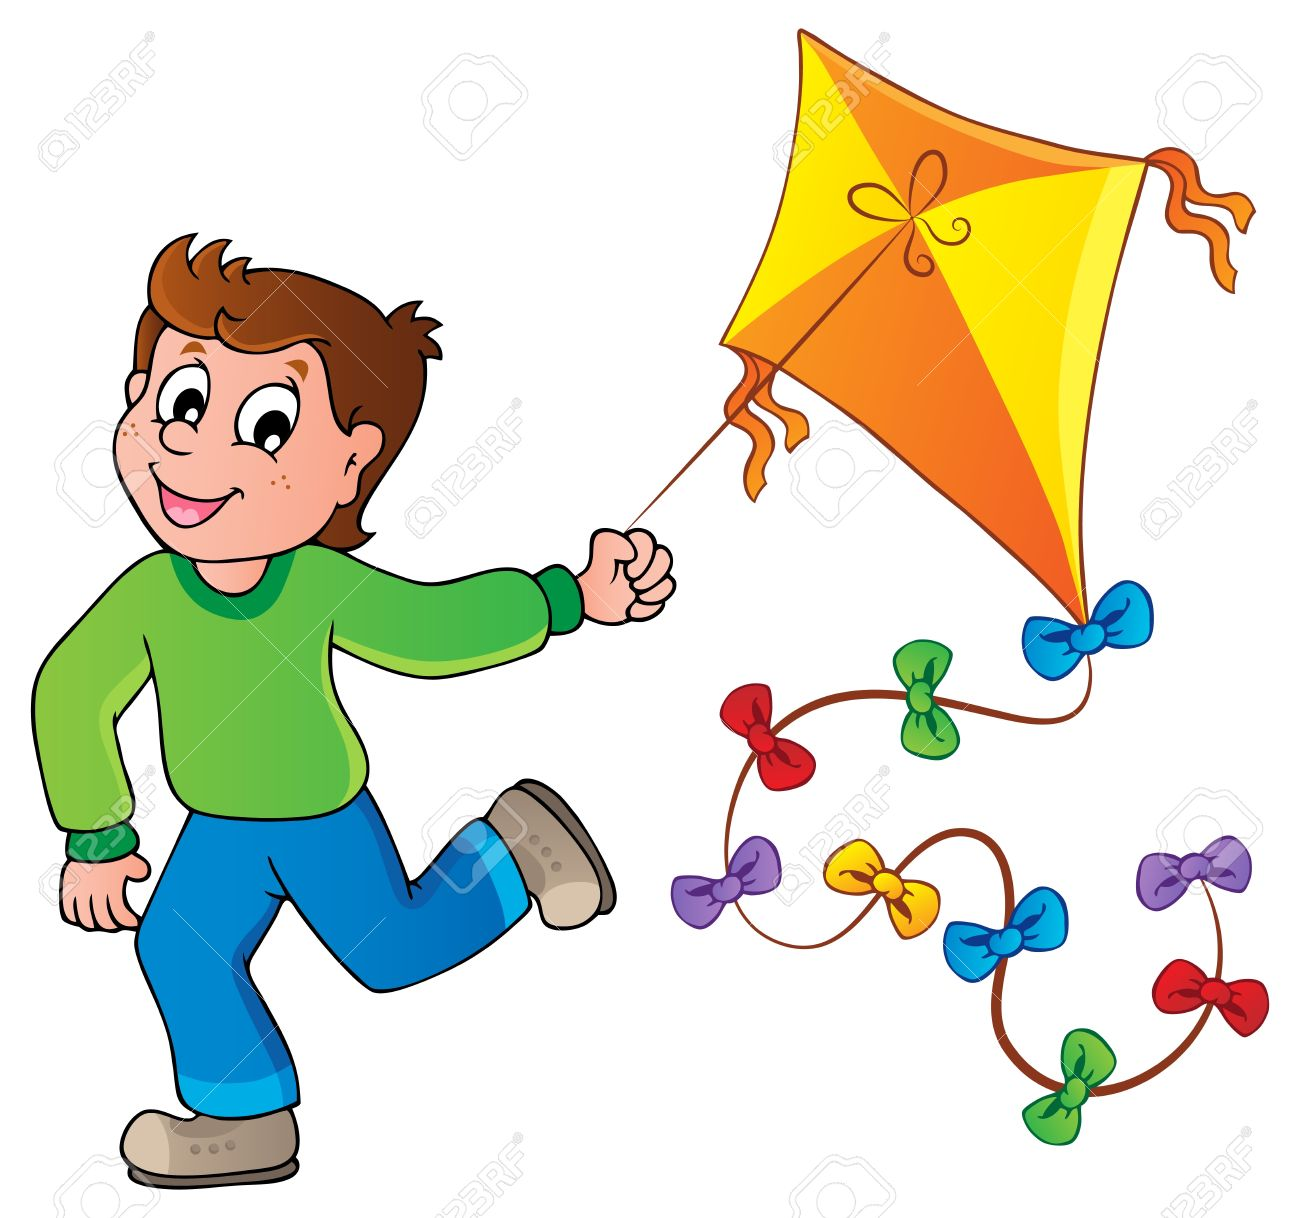 2,127 Kite Flying Stock Vector Illustration And Royalty Free Kite.